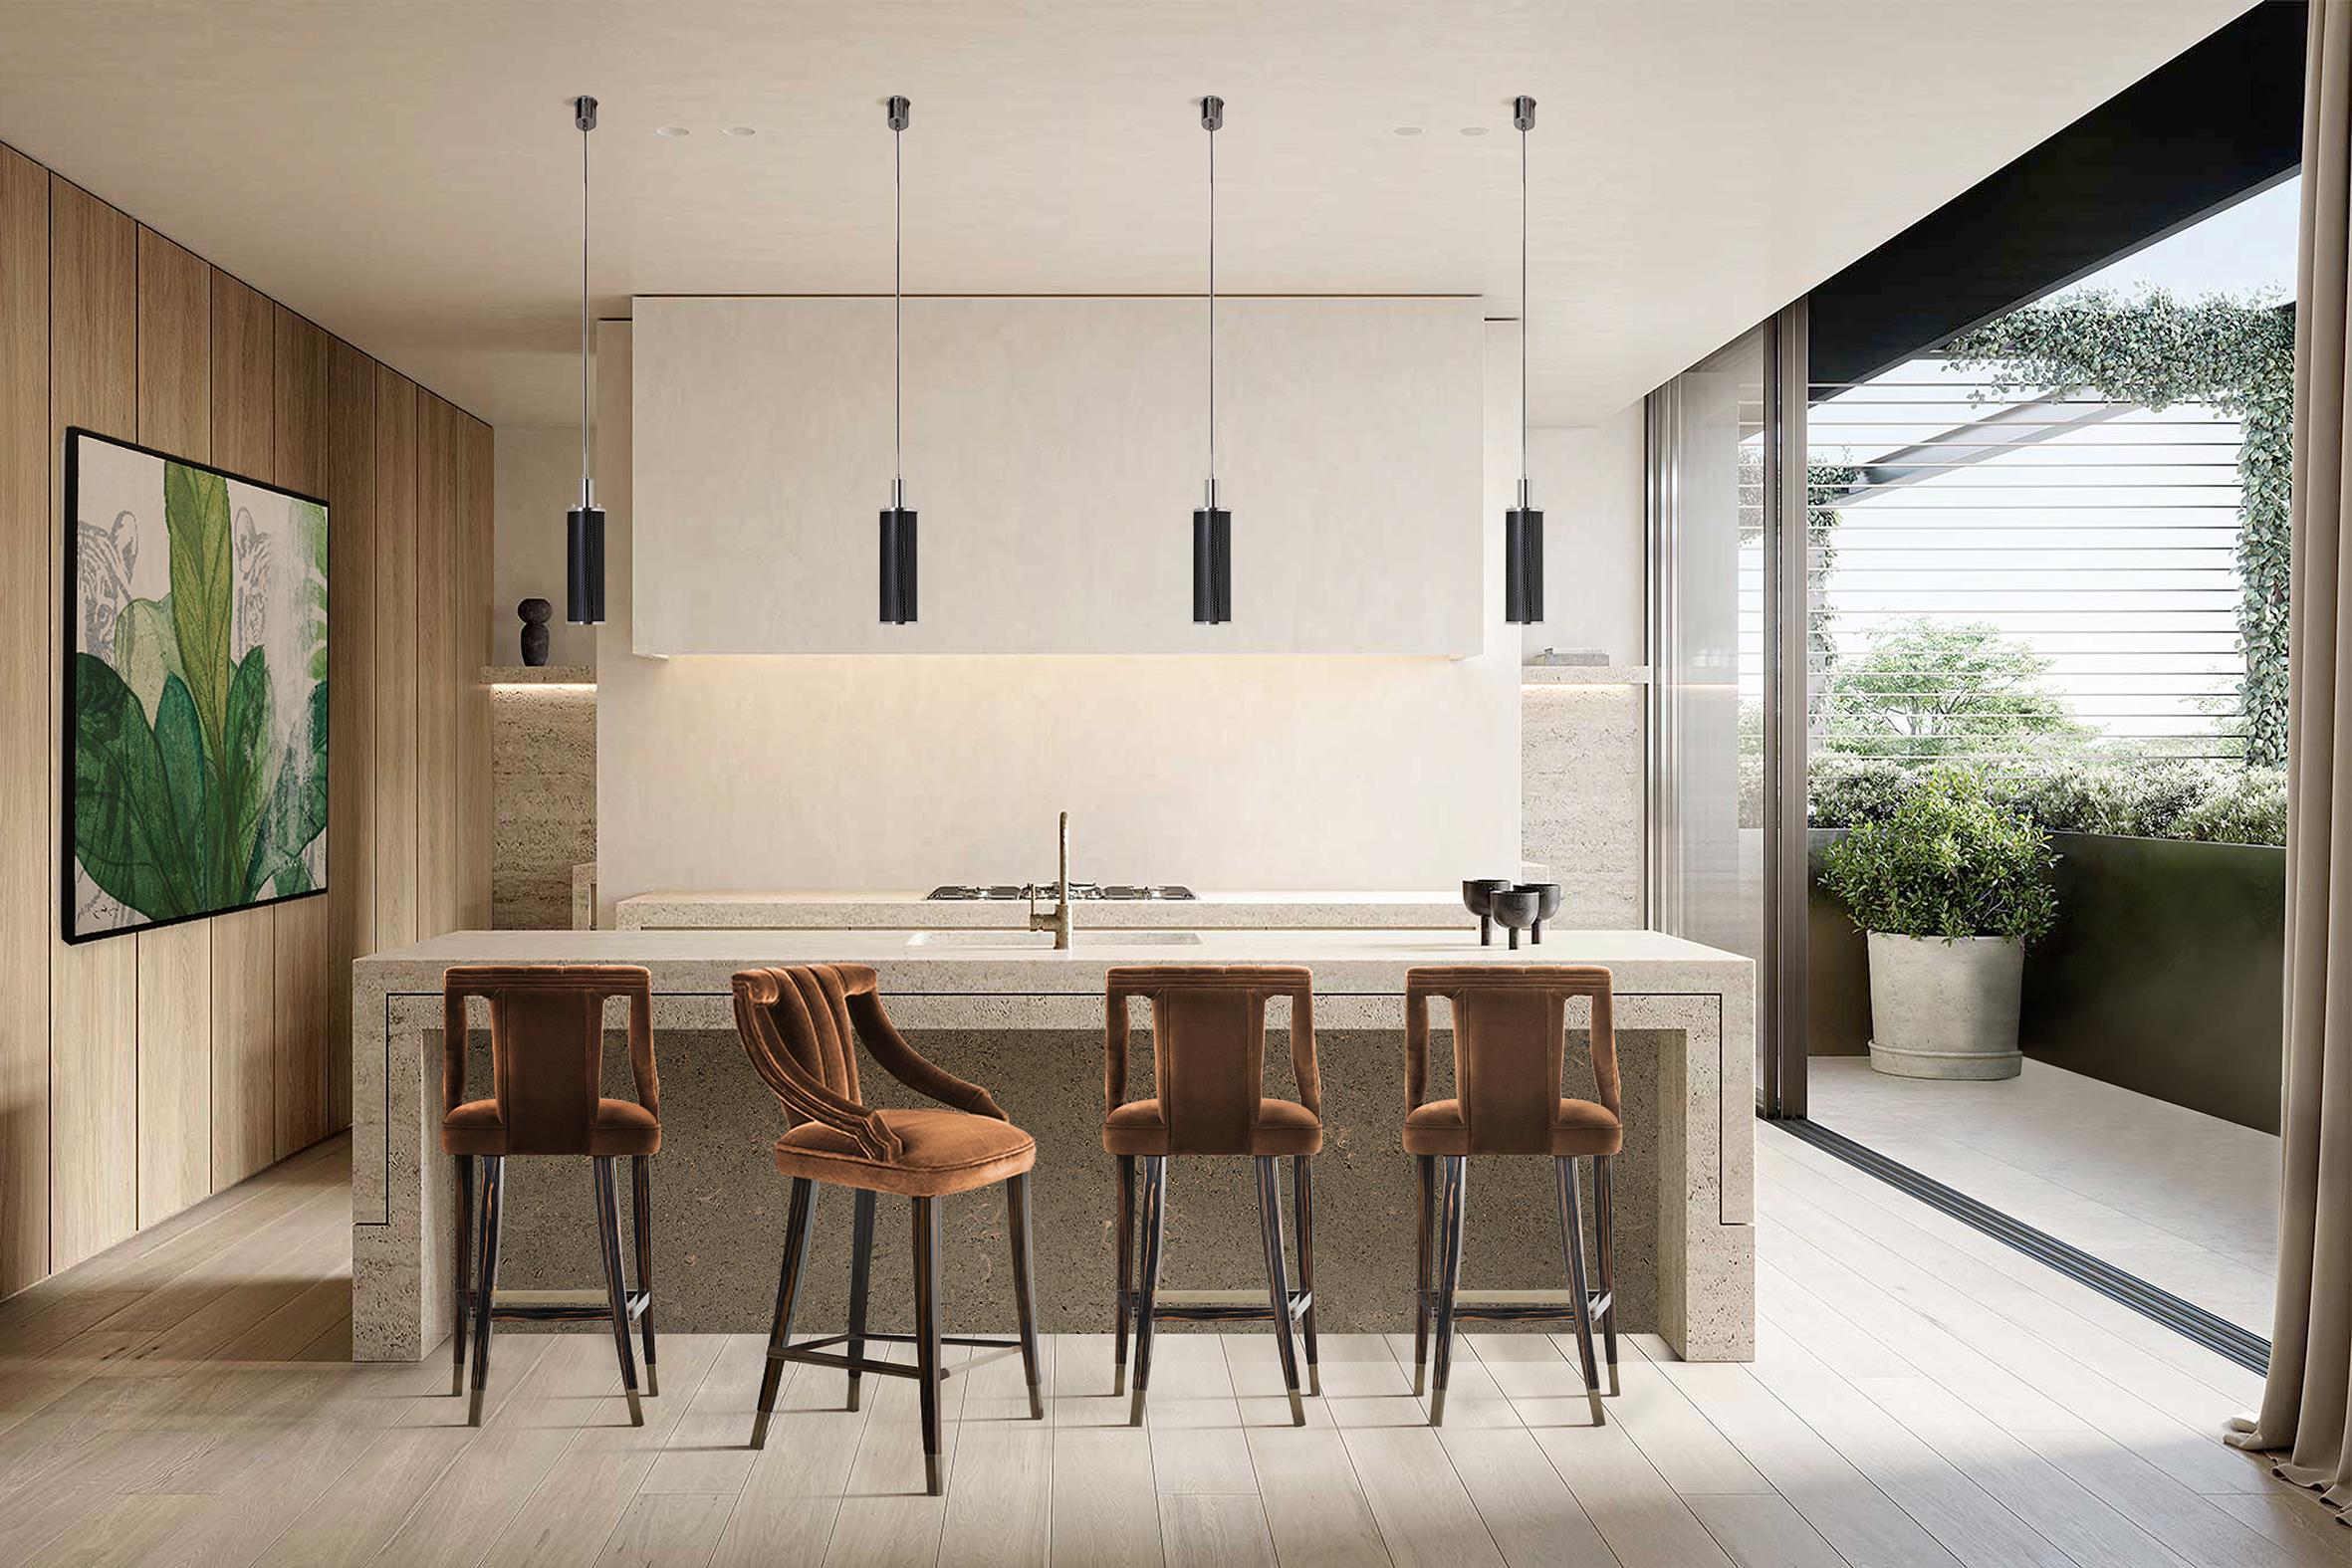 2021 Dubai Home Trends That Will Transform Your Home Into a Crown Jewel of Design! dubai home trends 2021 Dubai Home Trends That Will Transform Your Home Into a Crown Jewel of Design! 3 1